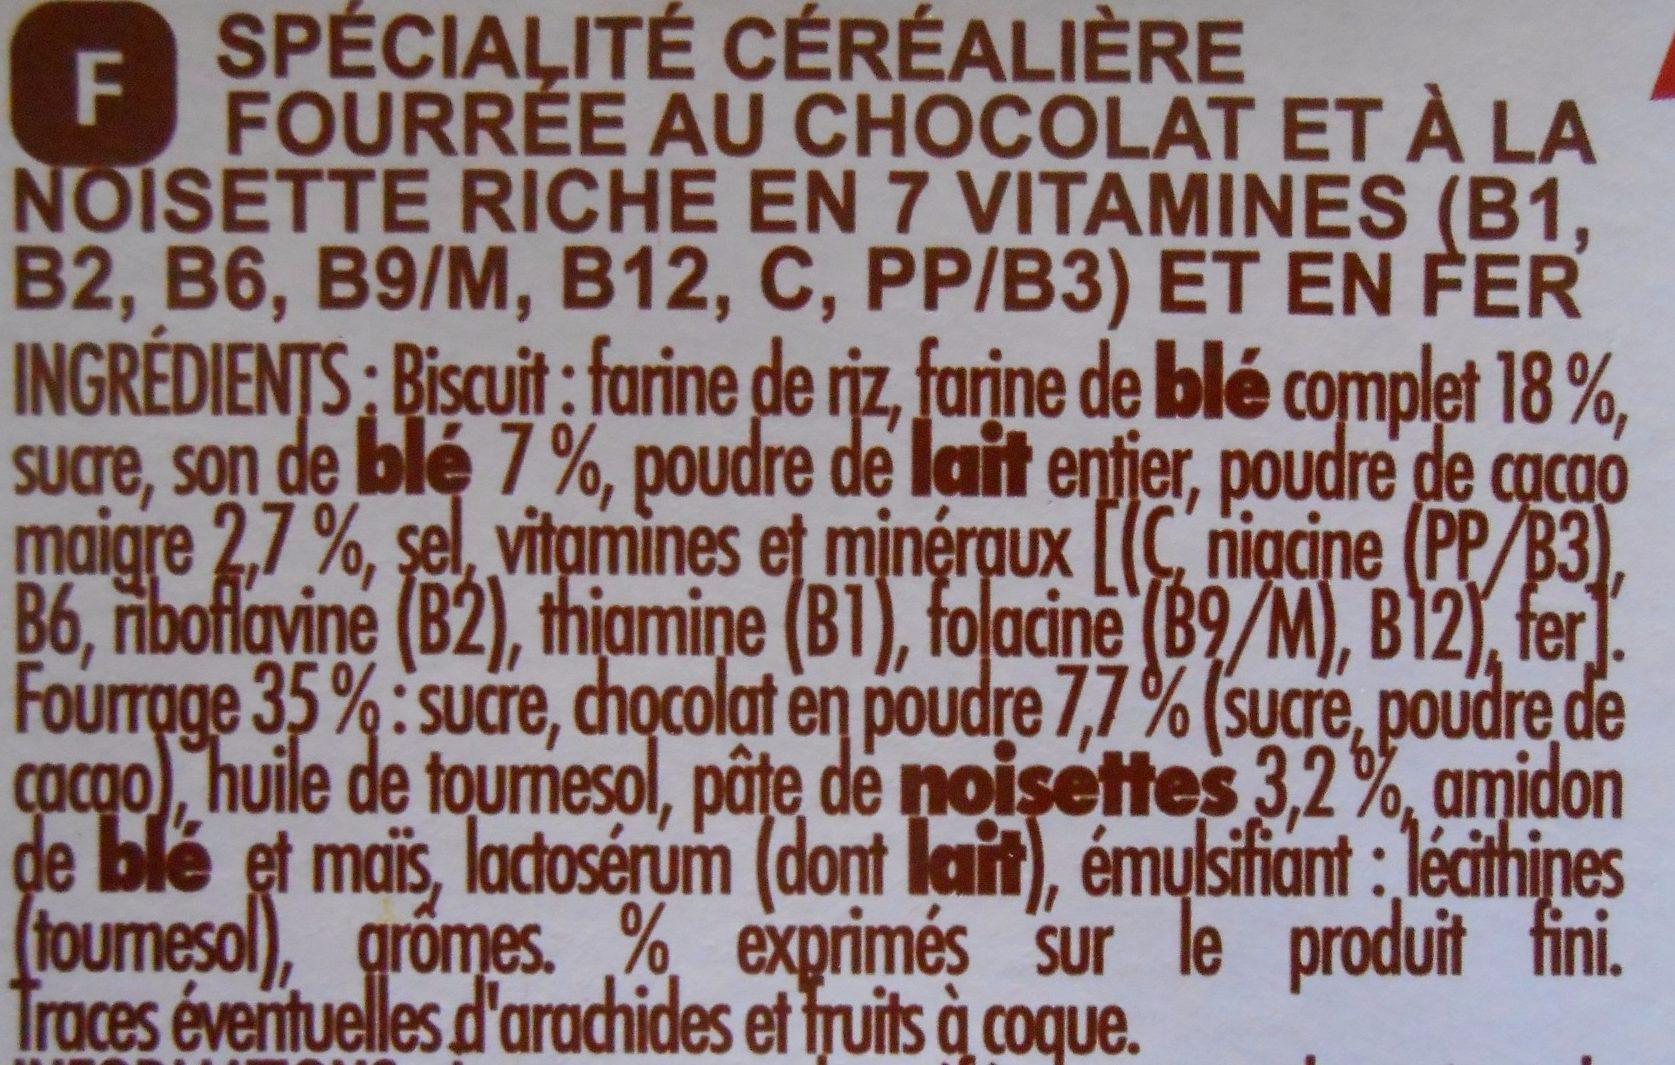 Chabrior Maxi Pack Crica Choc' Chocolat Noisette - Ingrédients - fr